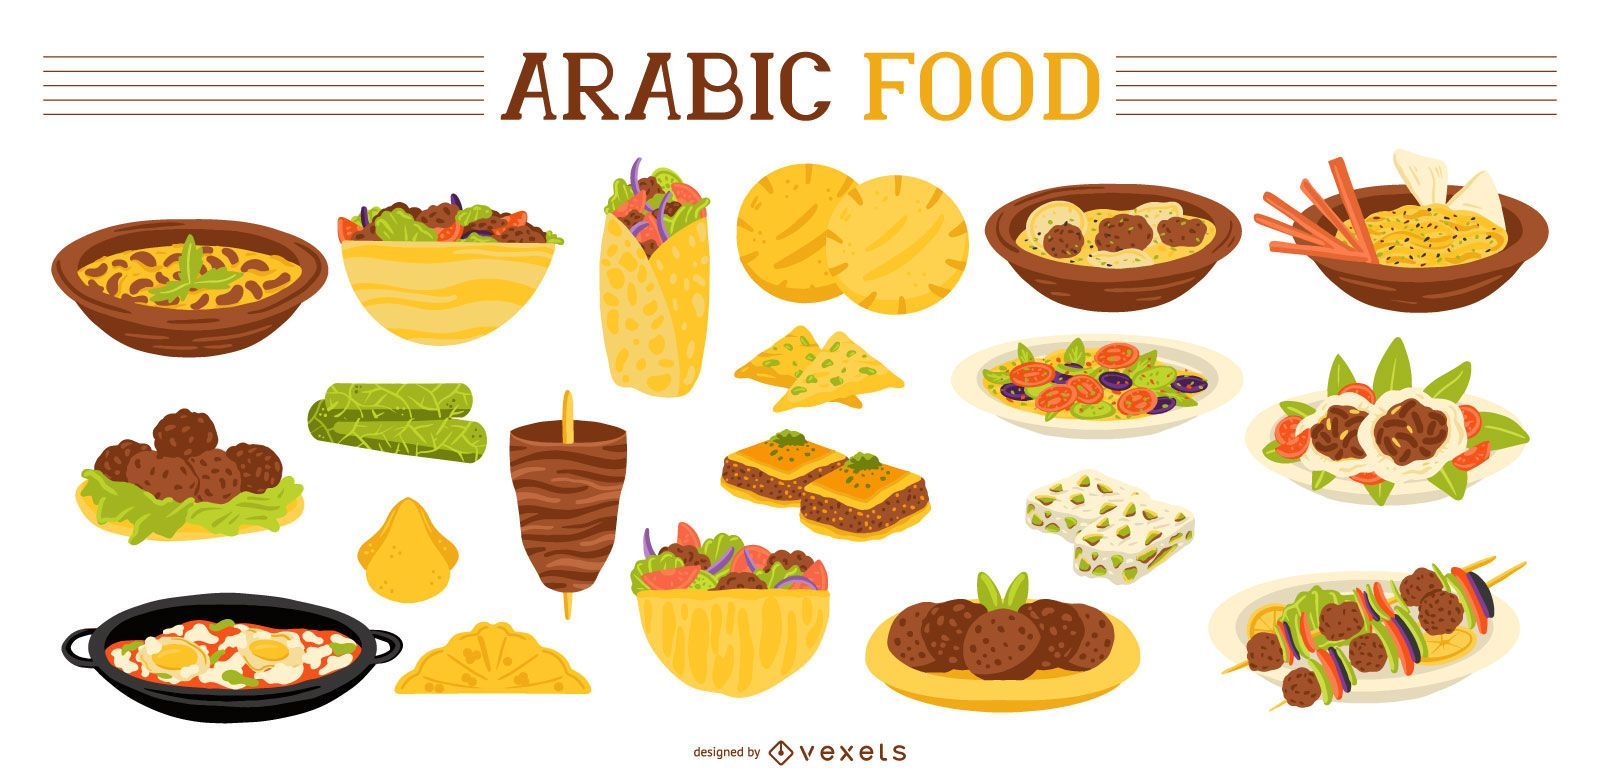 Arabische Lebensmittelsammlung